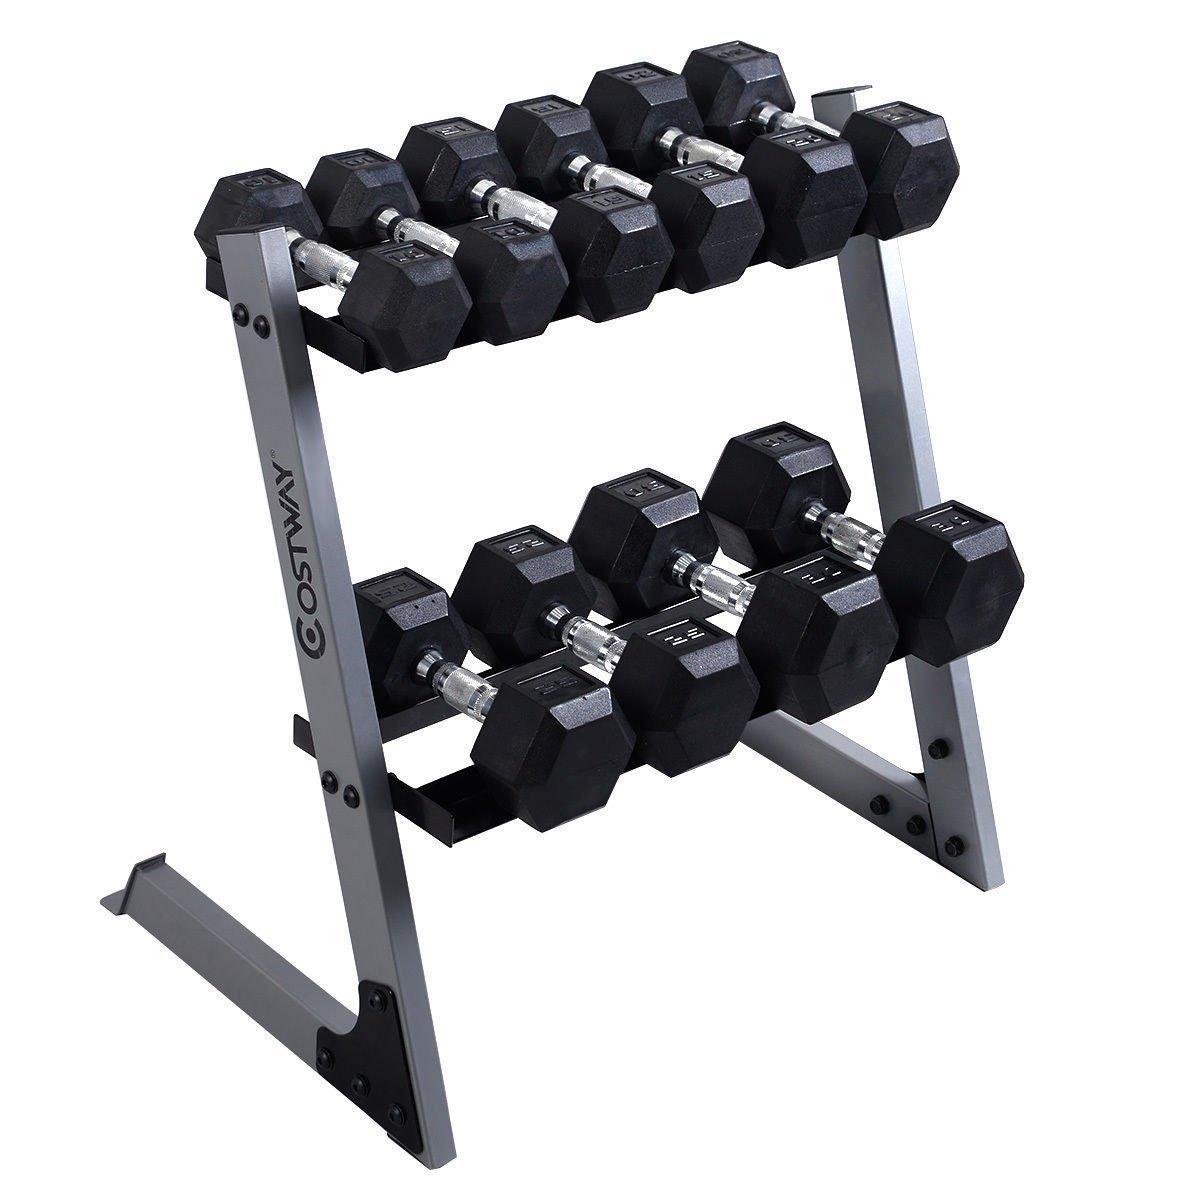 Giantex Dumbbell Weight Storage Rack